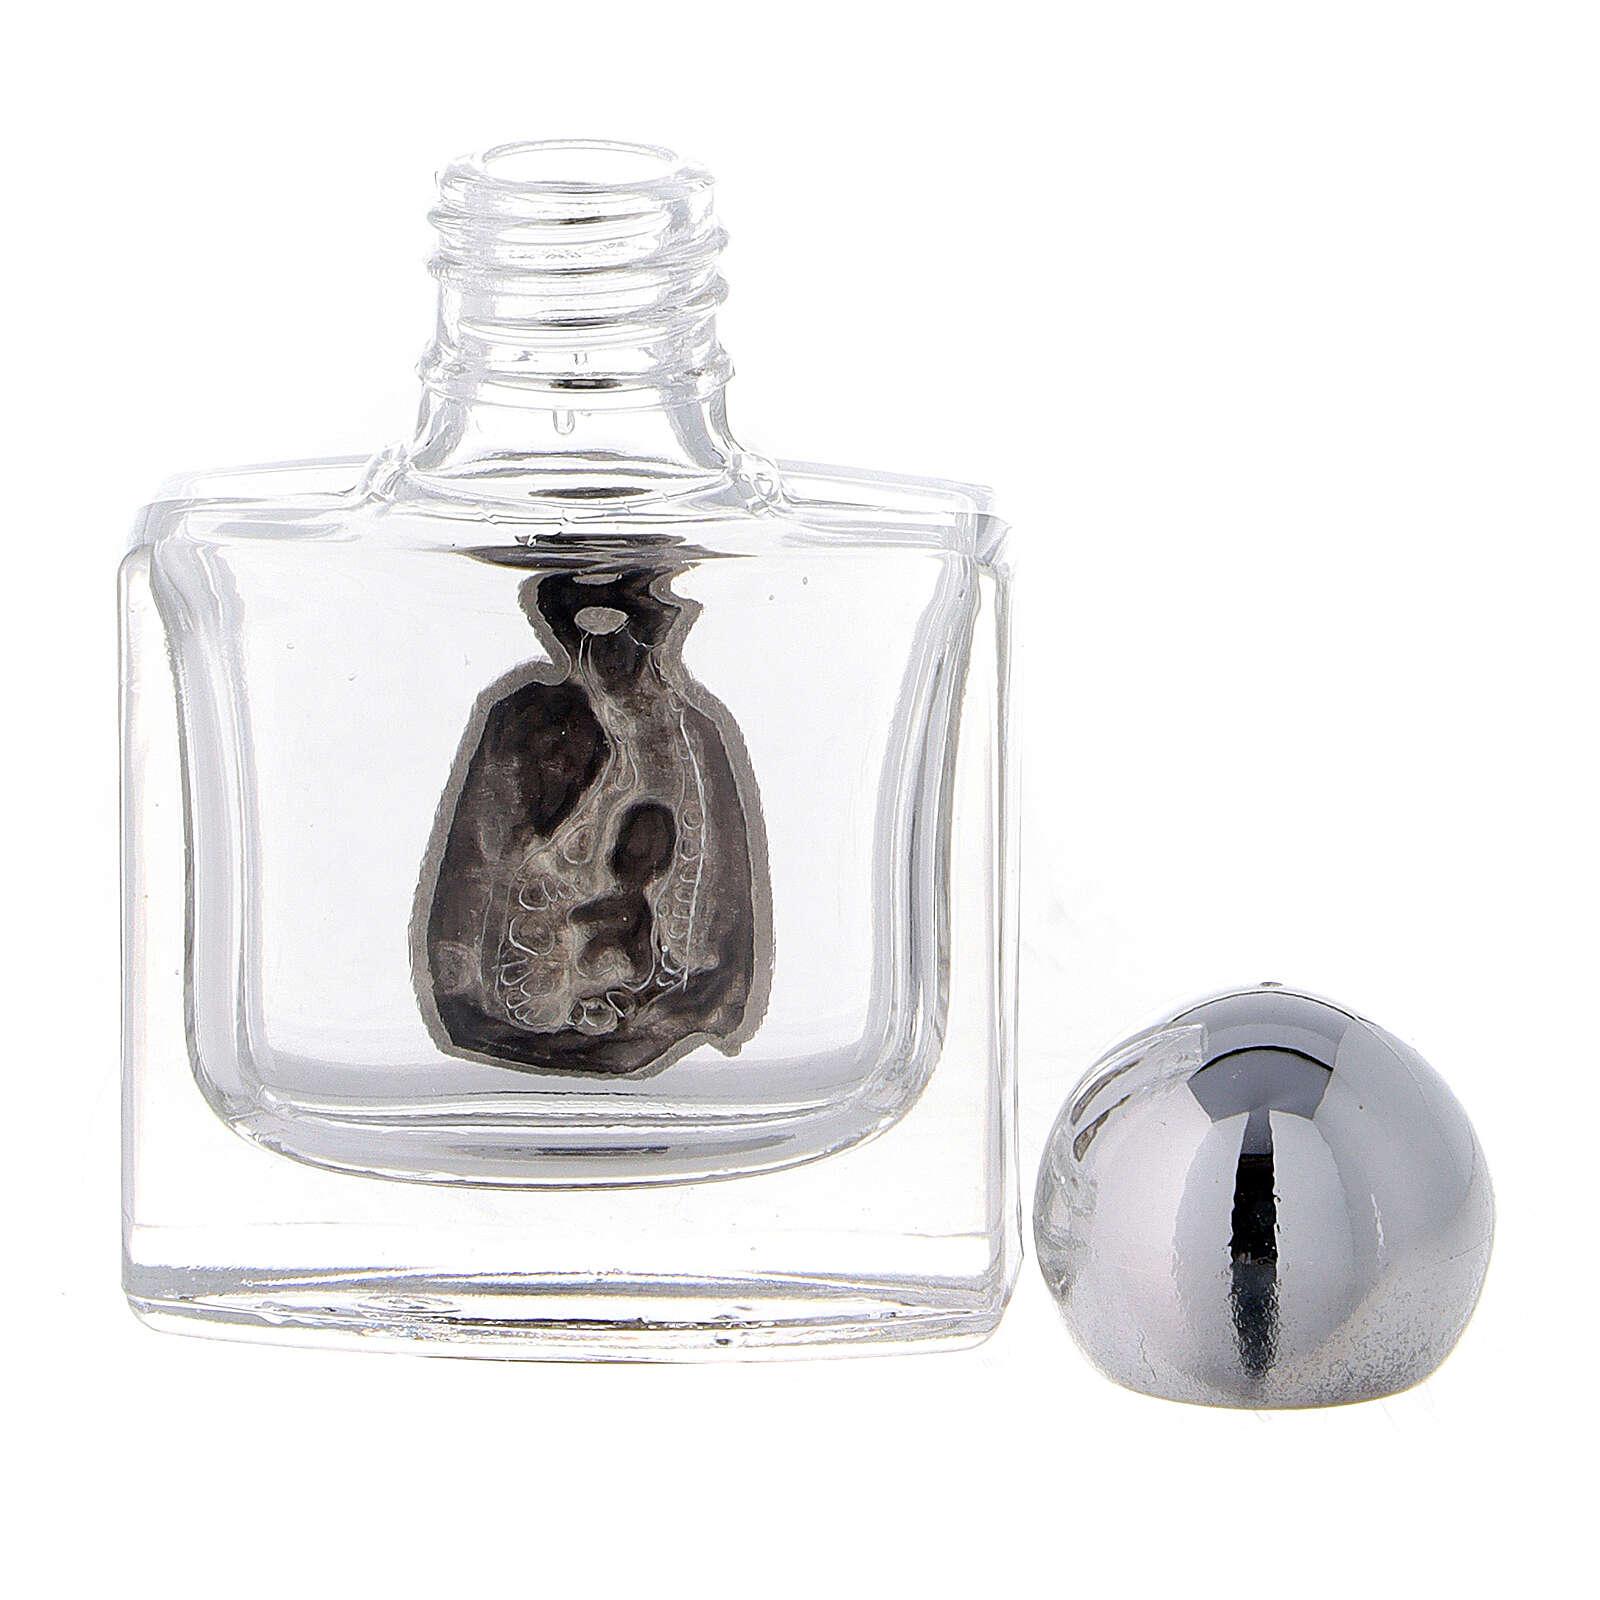 Bottiglietta acquasanta 10 ml Sacra Famiglia (CONF.50 PZ.) vetro 3